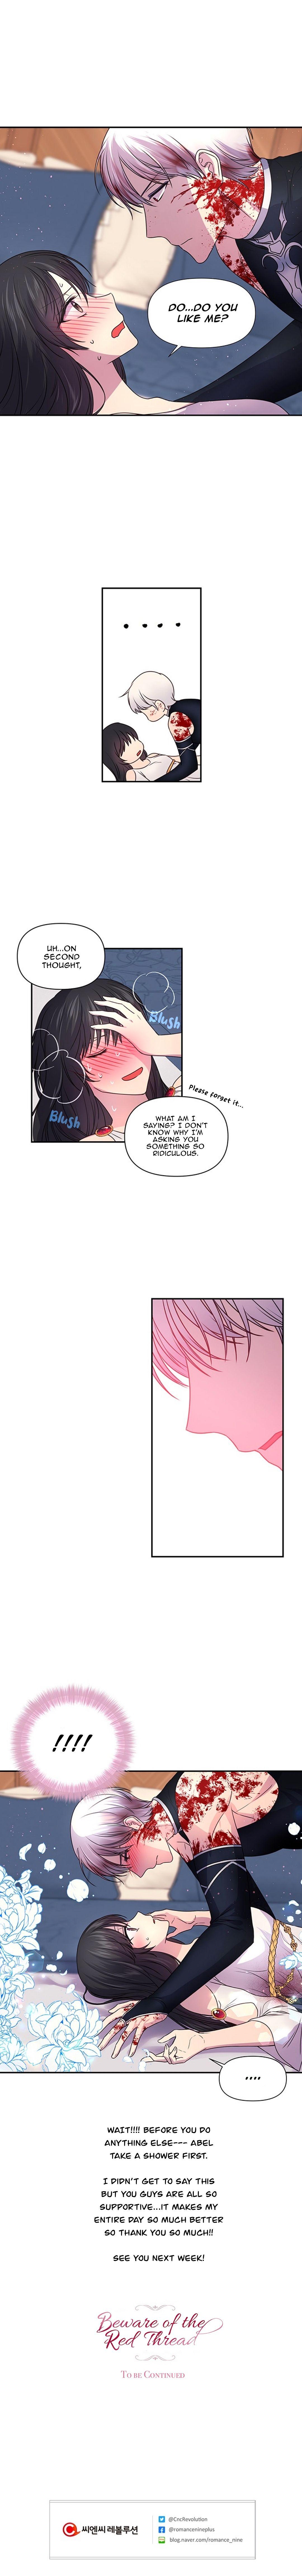 Beware of the red thread chapter 10 page 13 mangakakalot